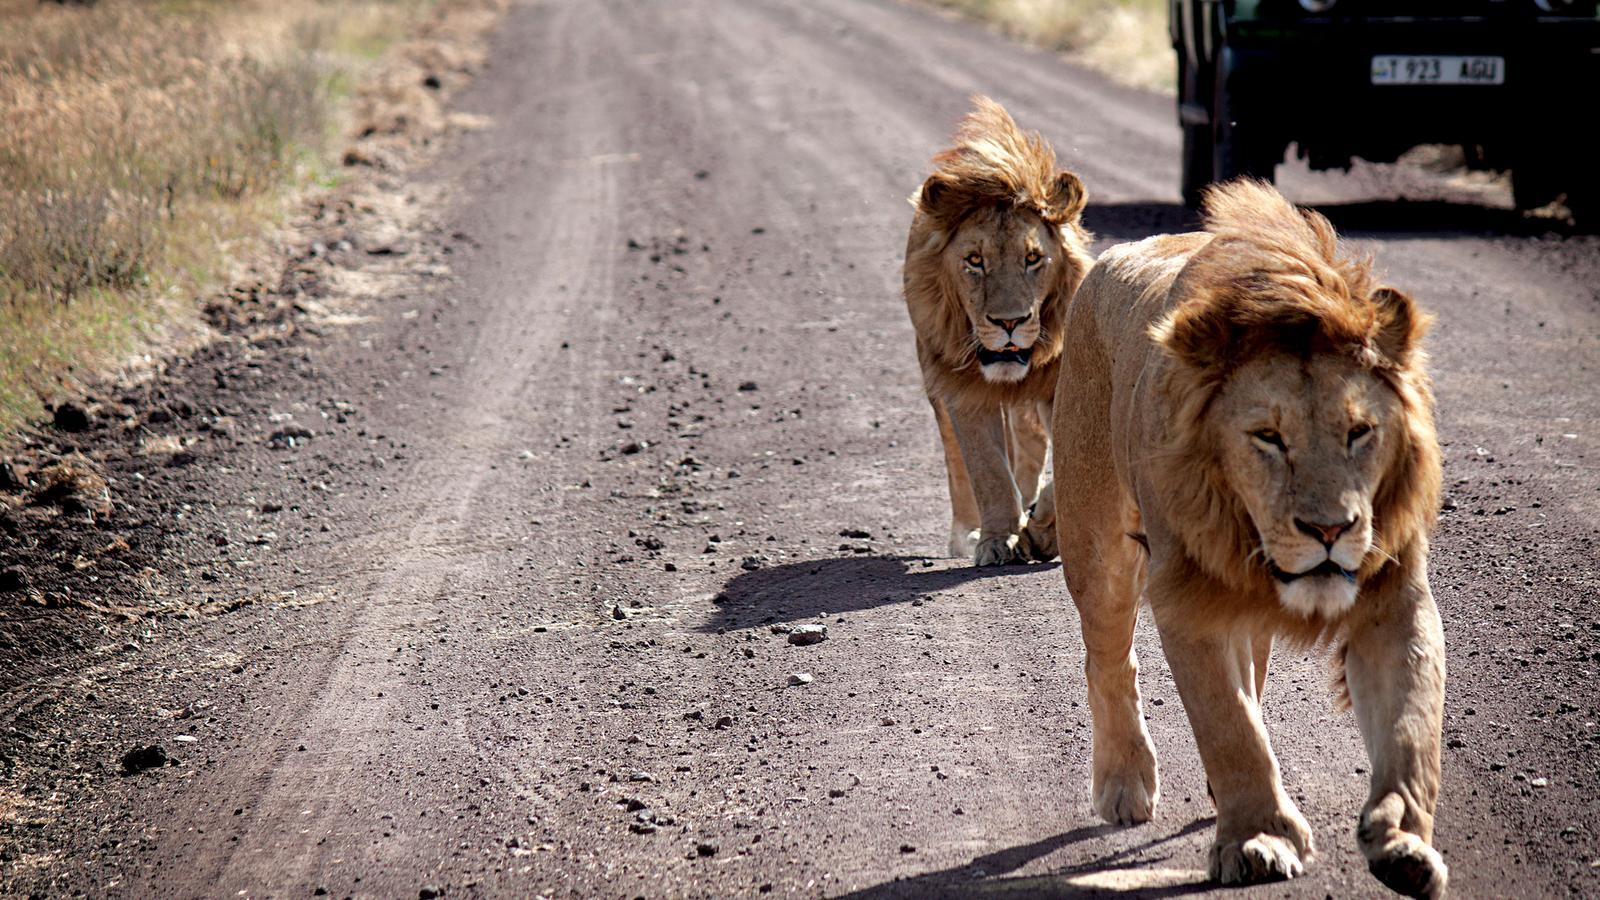 Reisen für junge Leute Afrika traveljunkies Kenia Tansania Sansibar Serengeti Nairobi Ngorongoro Gruppebreise Abenteuerreise Erlebnisreise Safari Camping Adventure Löwe